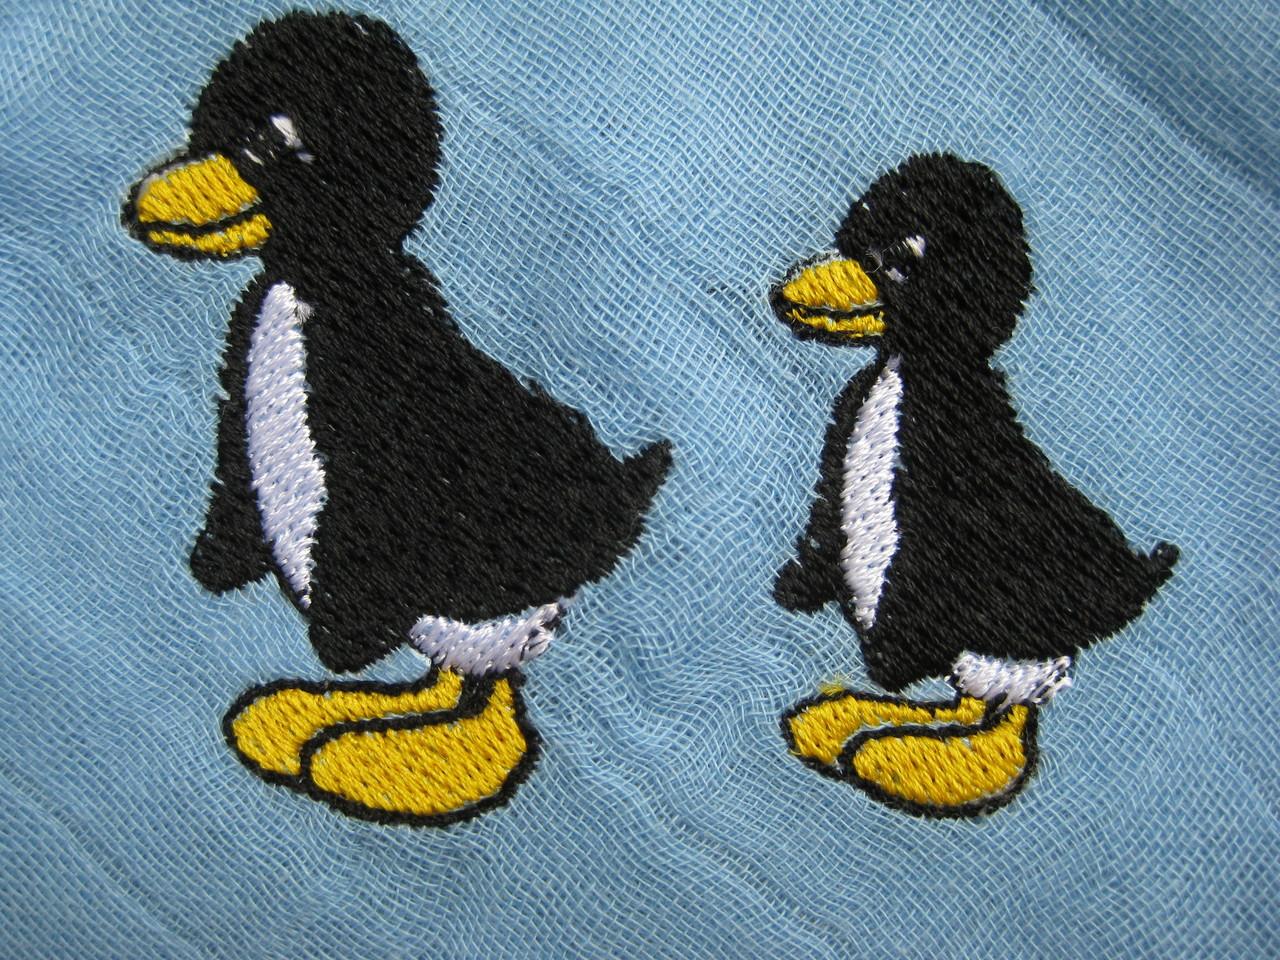 Pinguine auf Nuscheli